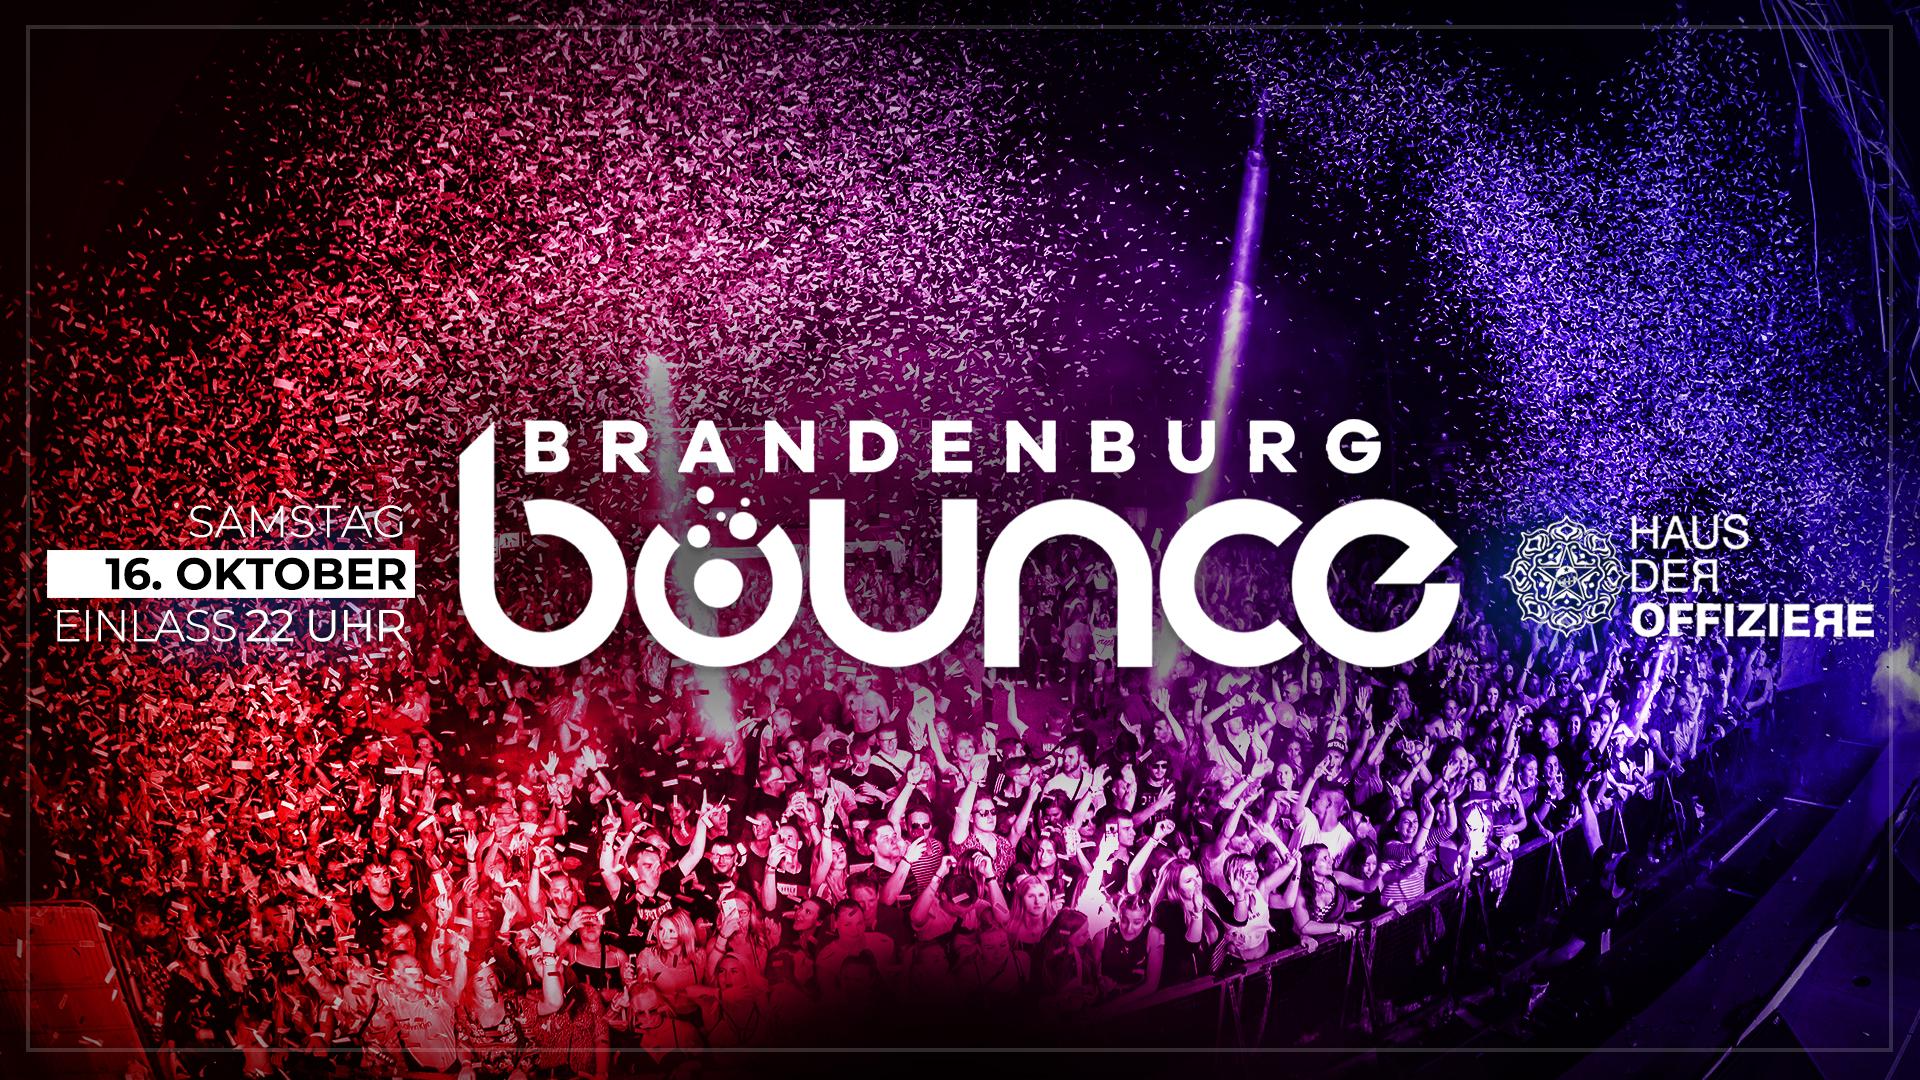 BRANDENBURG BOUNCE • WE ARE BACK | 16.10.